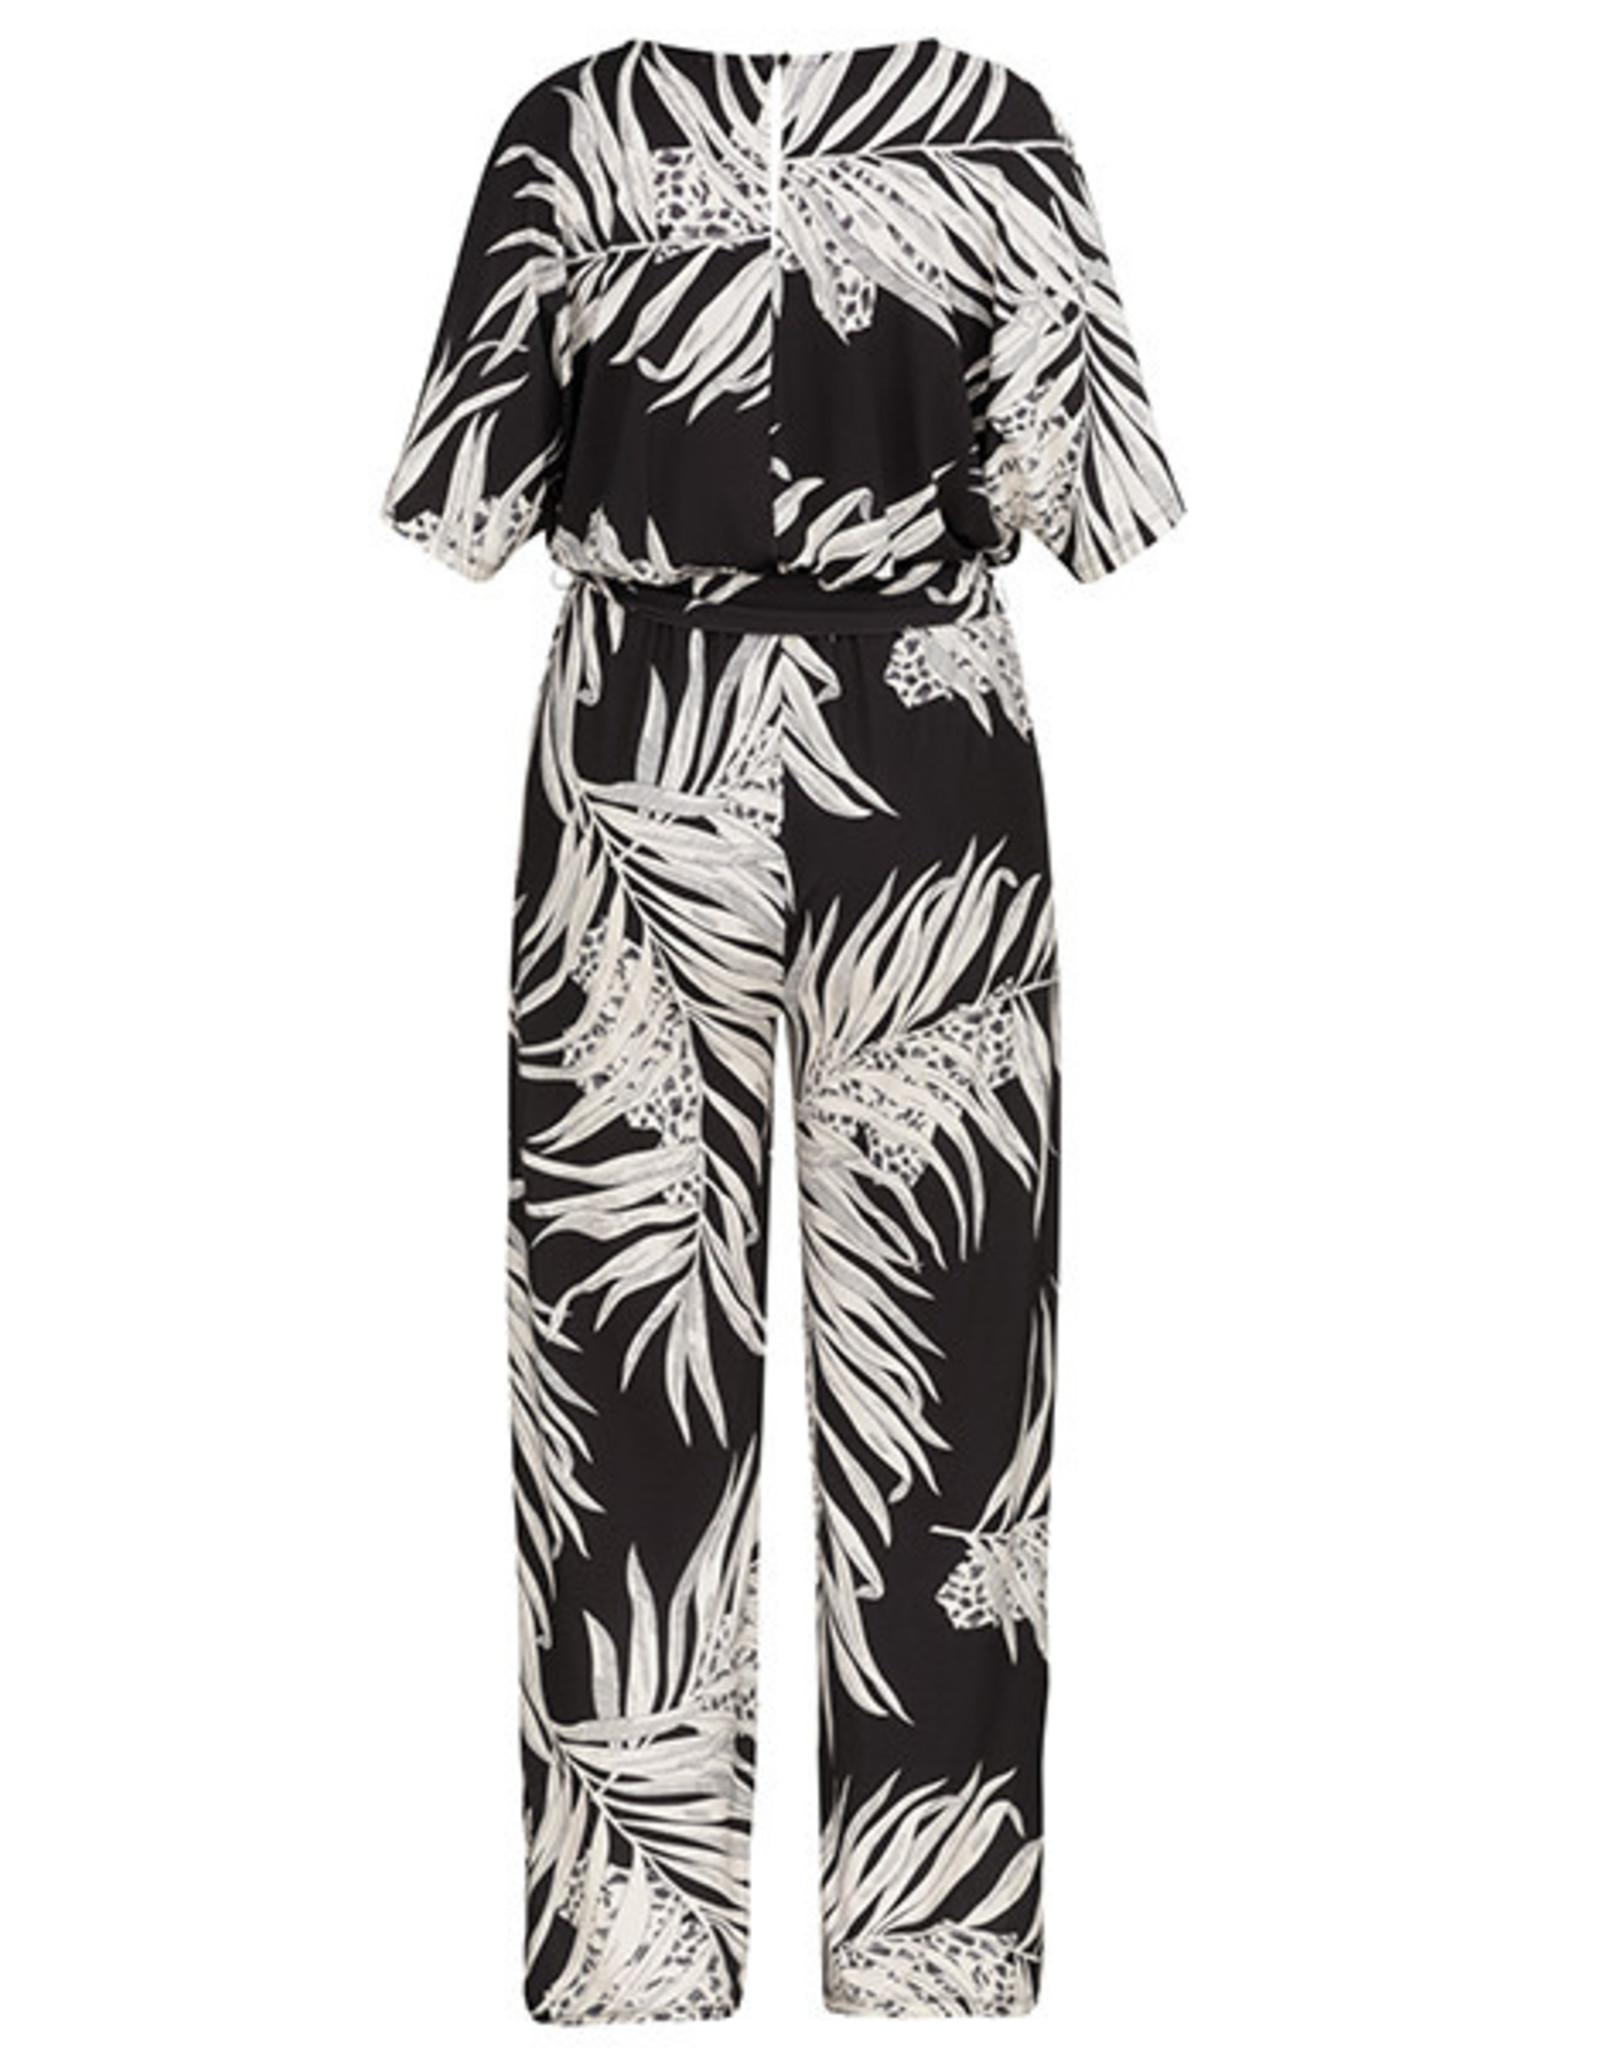 Tribal Tribal Dolman Sleeve Jumpsuit - SMALL